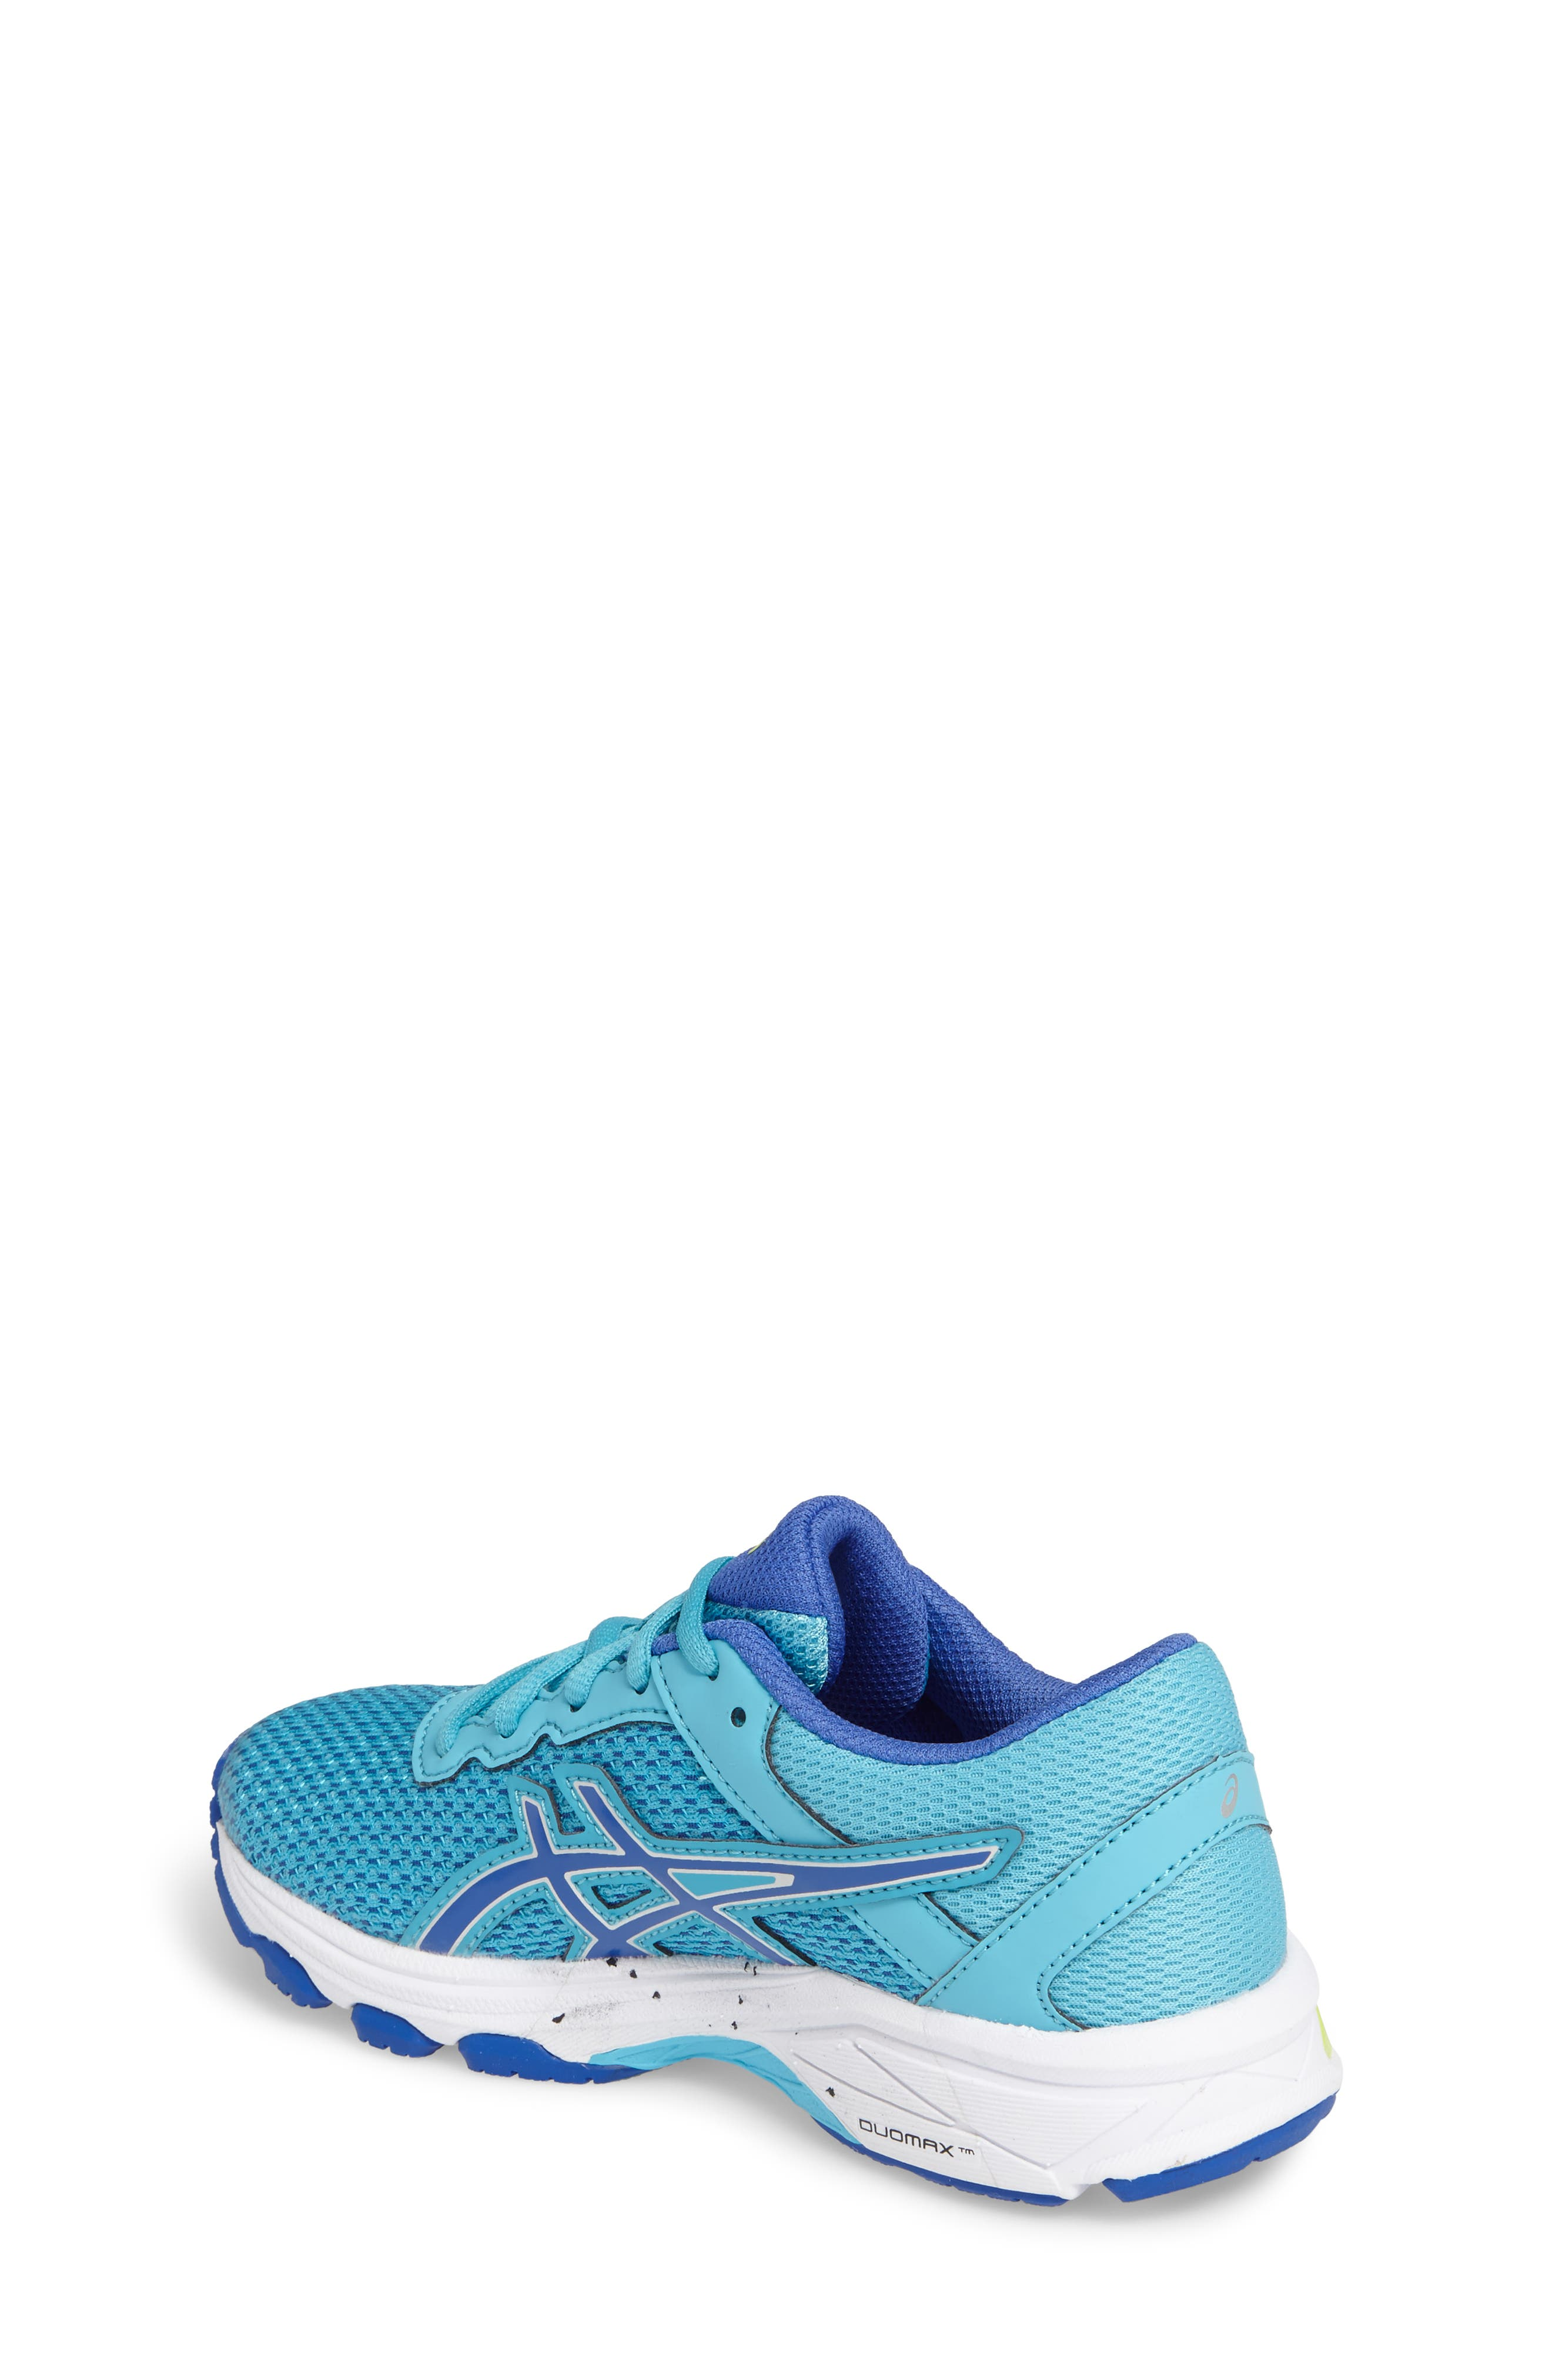 Asics GT-1000<sup>™</sup> 6 GS Sneaker,                             Alternate thumbnail 7, color,